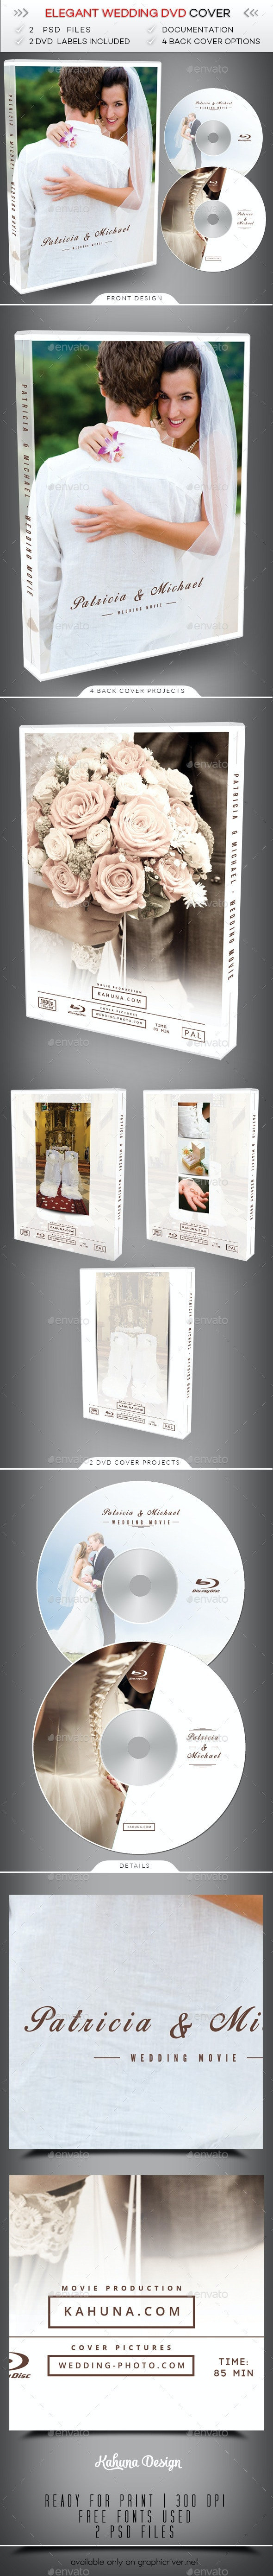 Wedding DVD Cover 3 - CD & DVD Artwork Print Templates